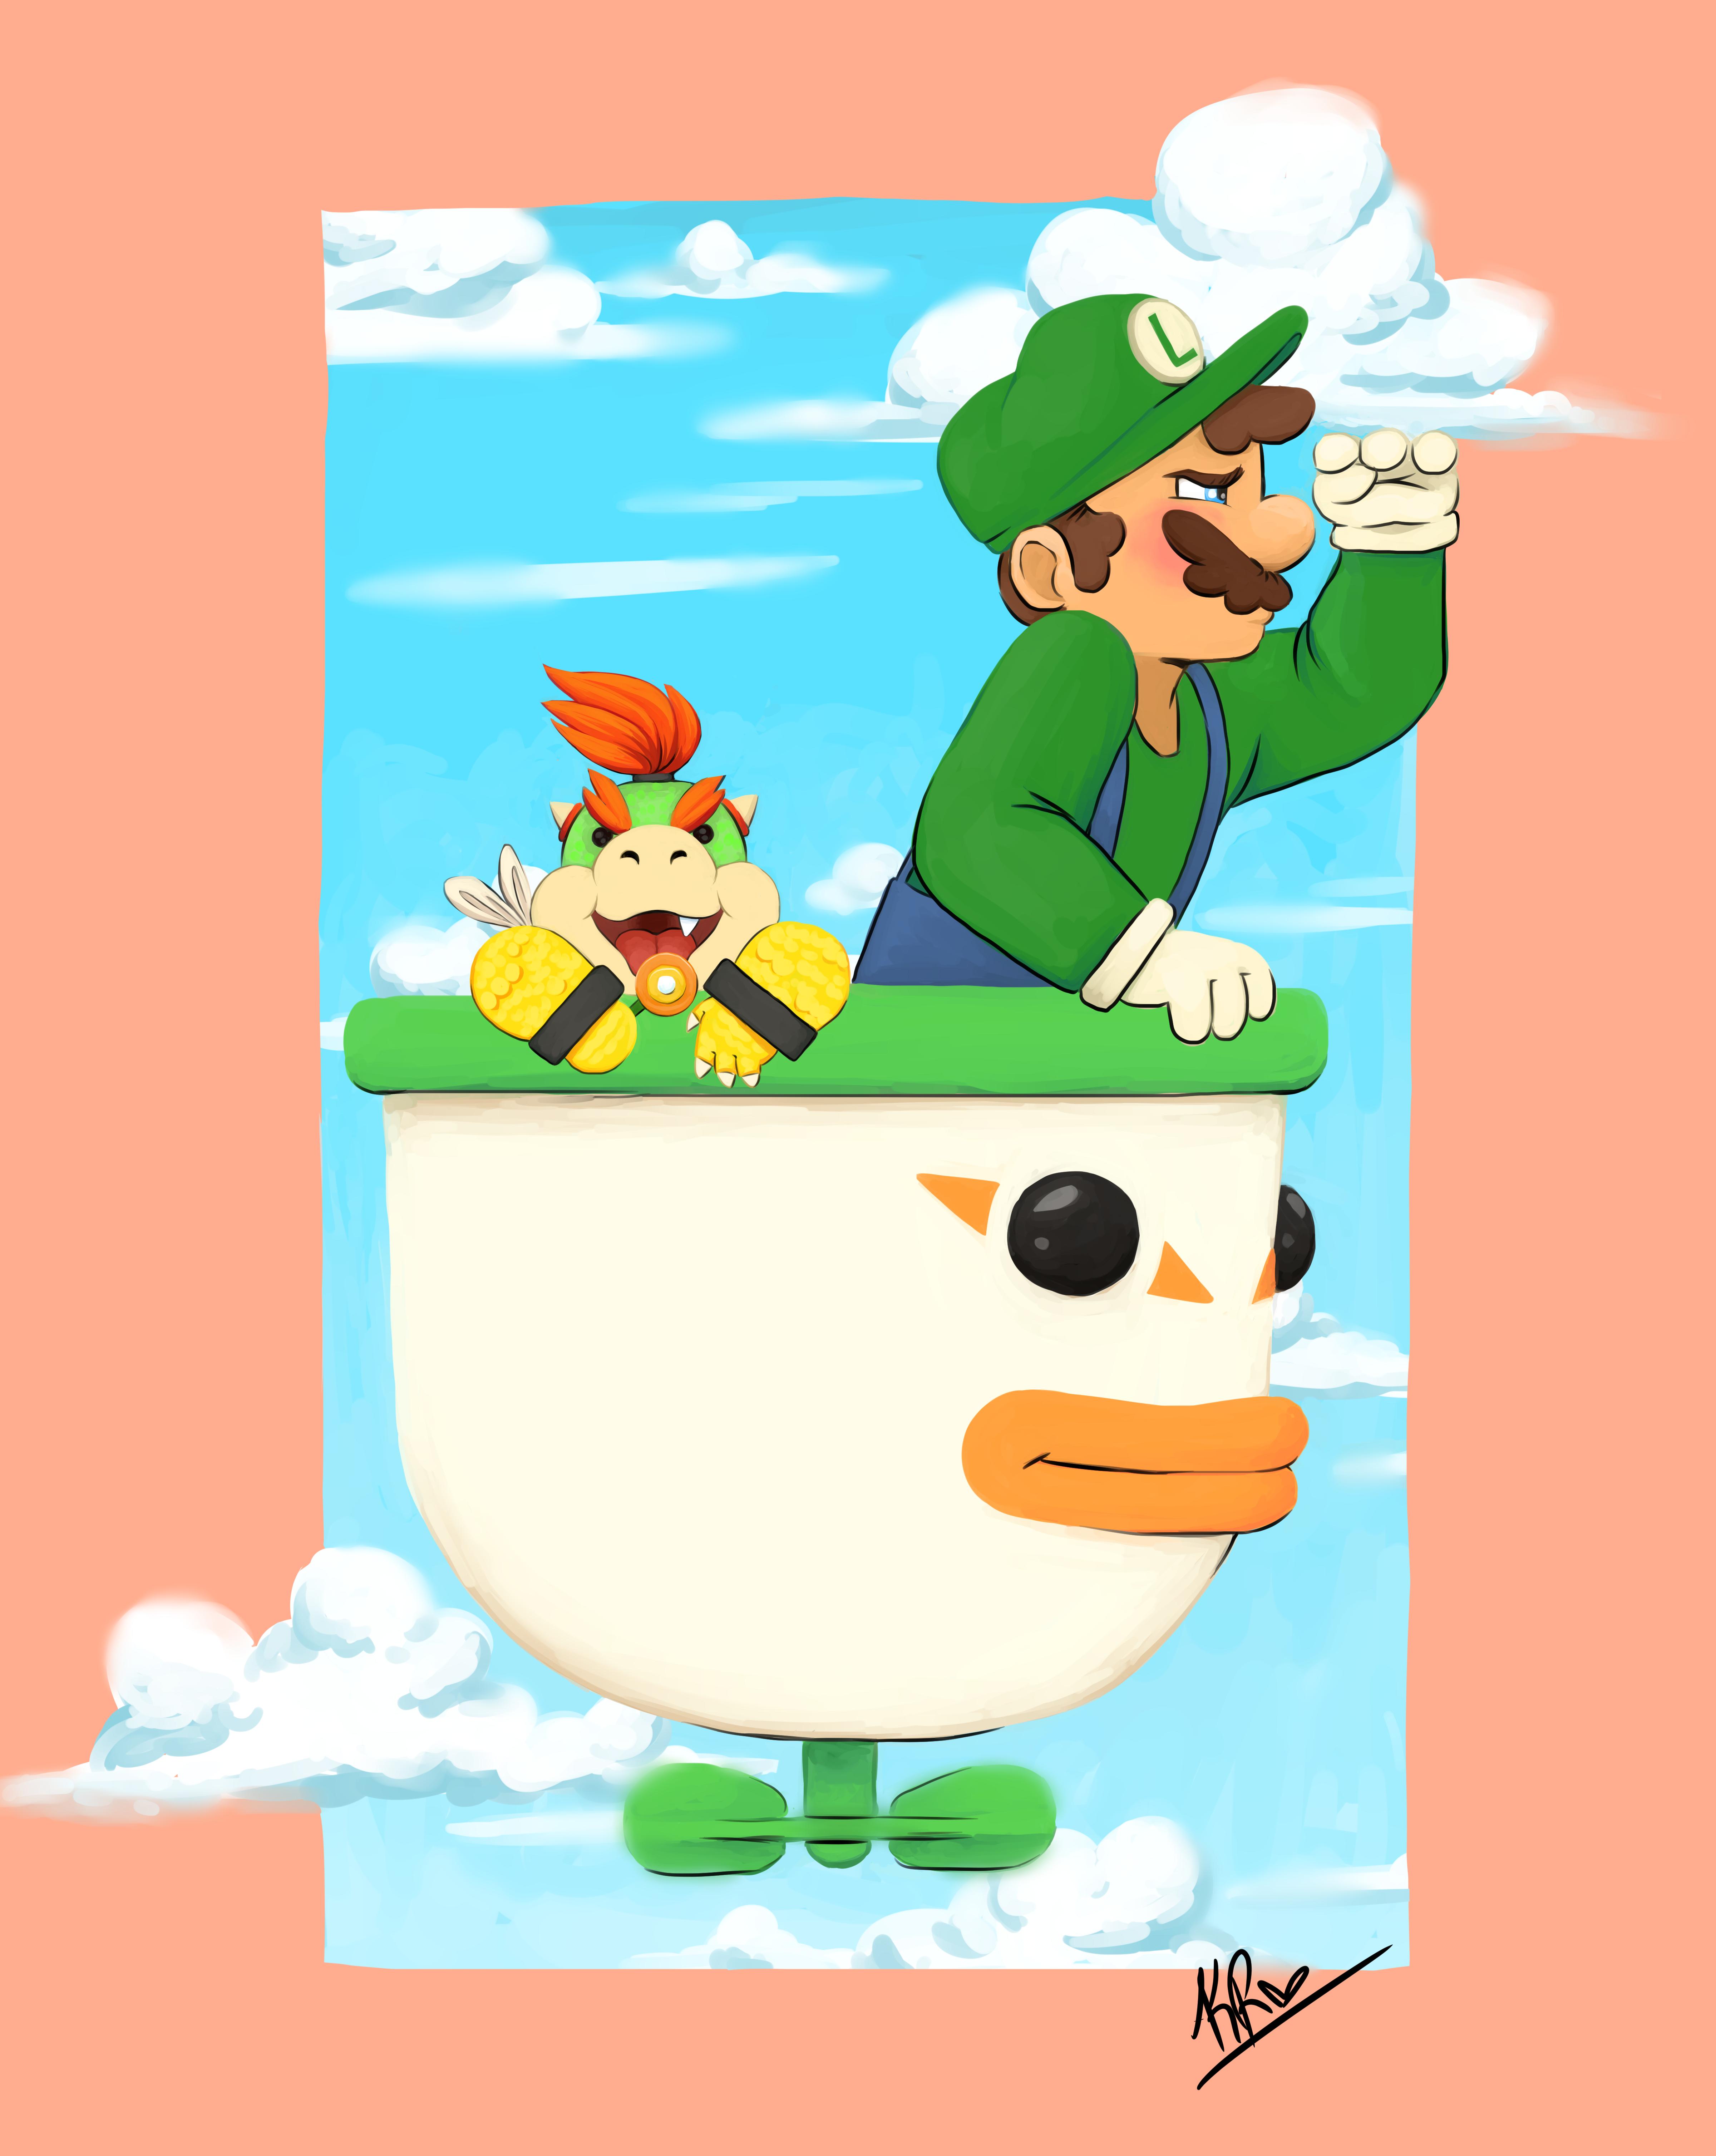 Luigi and son